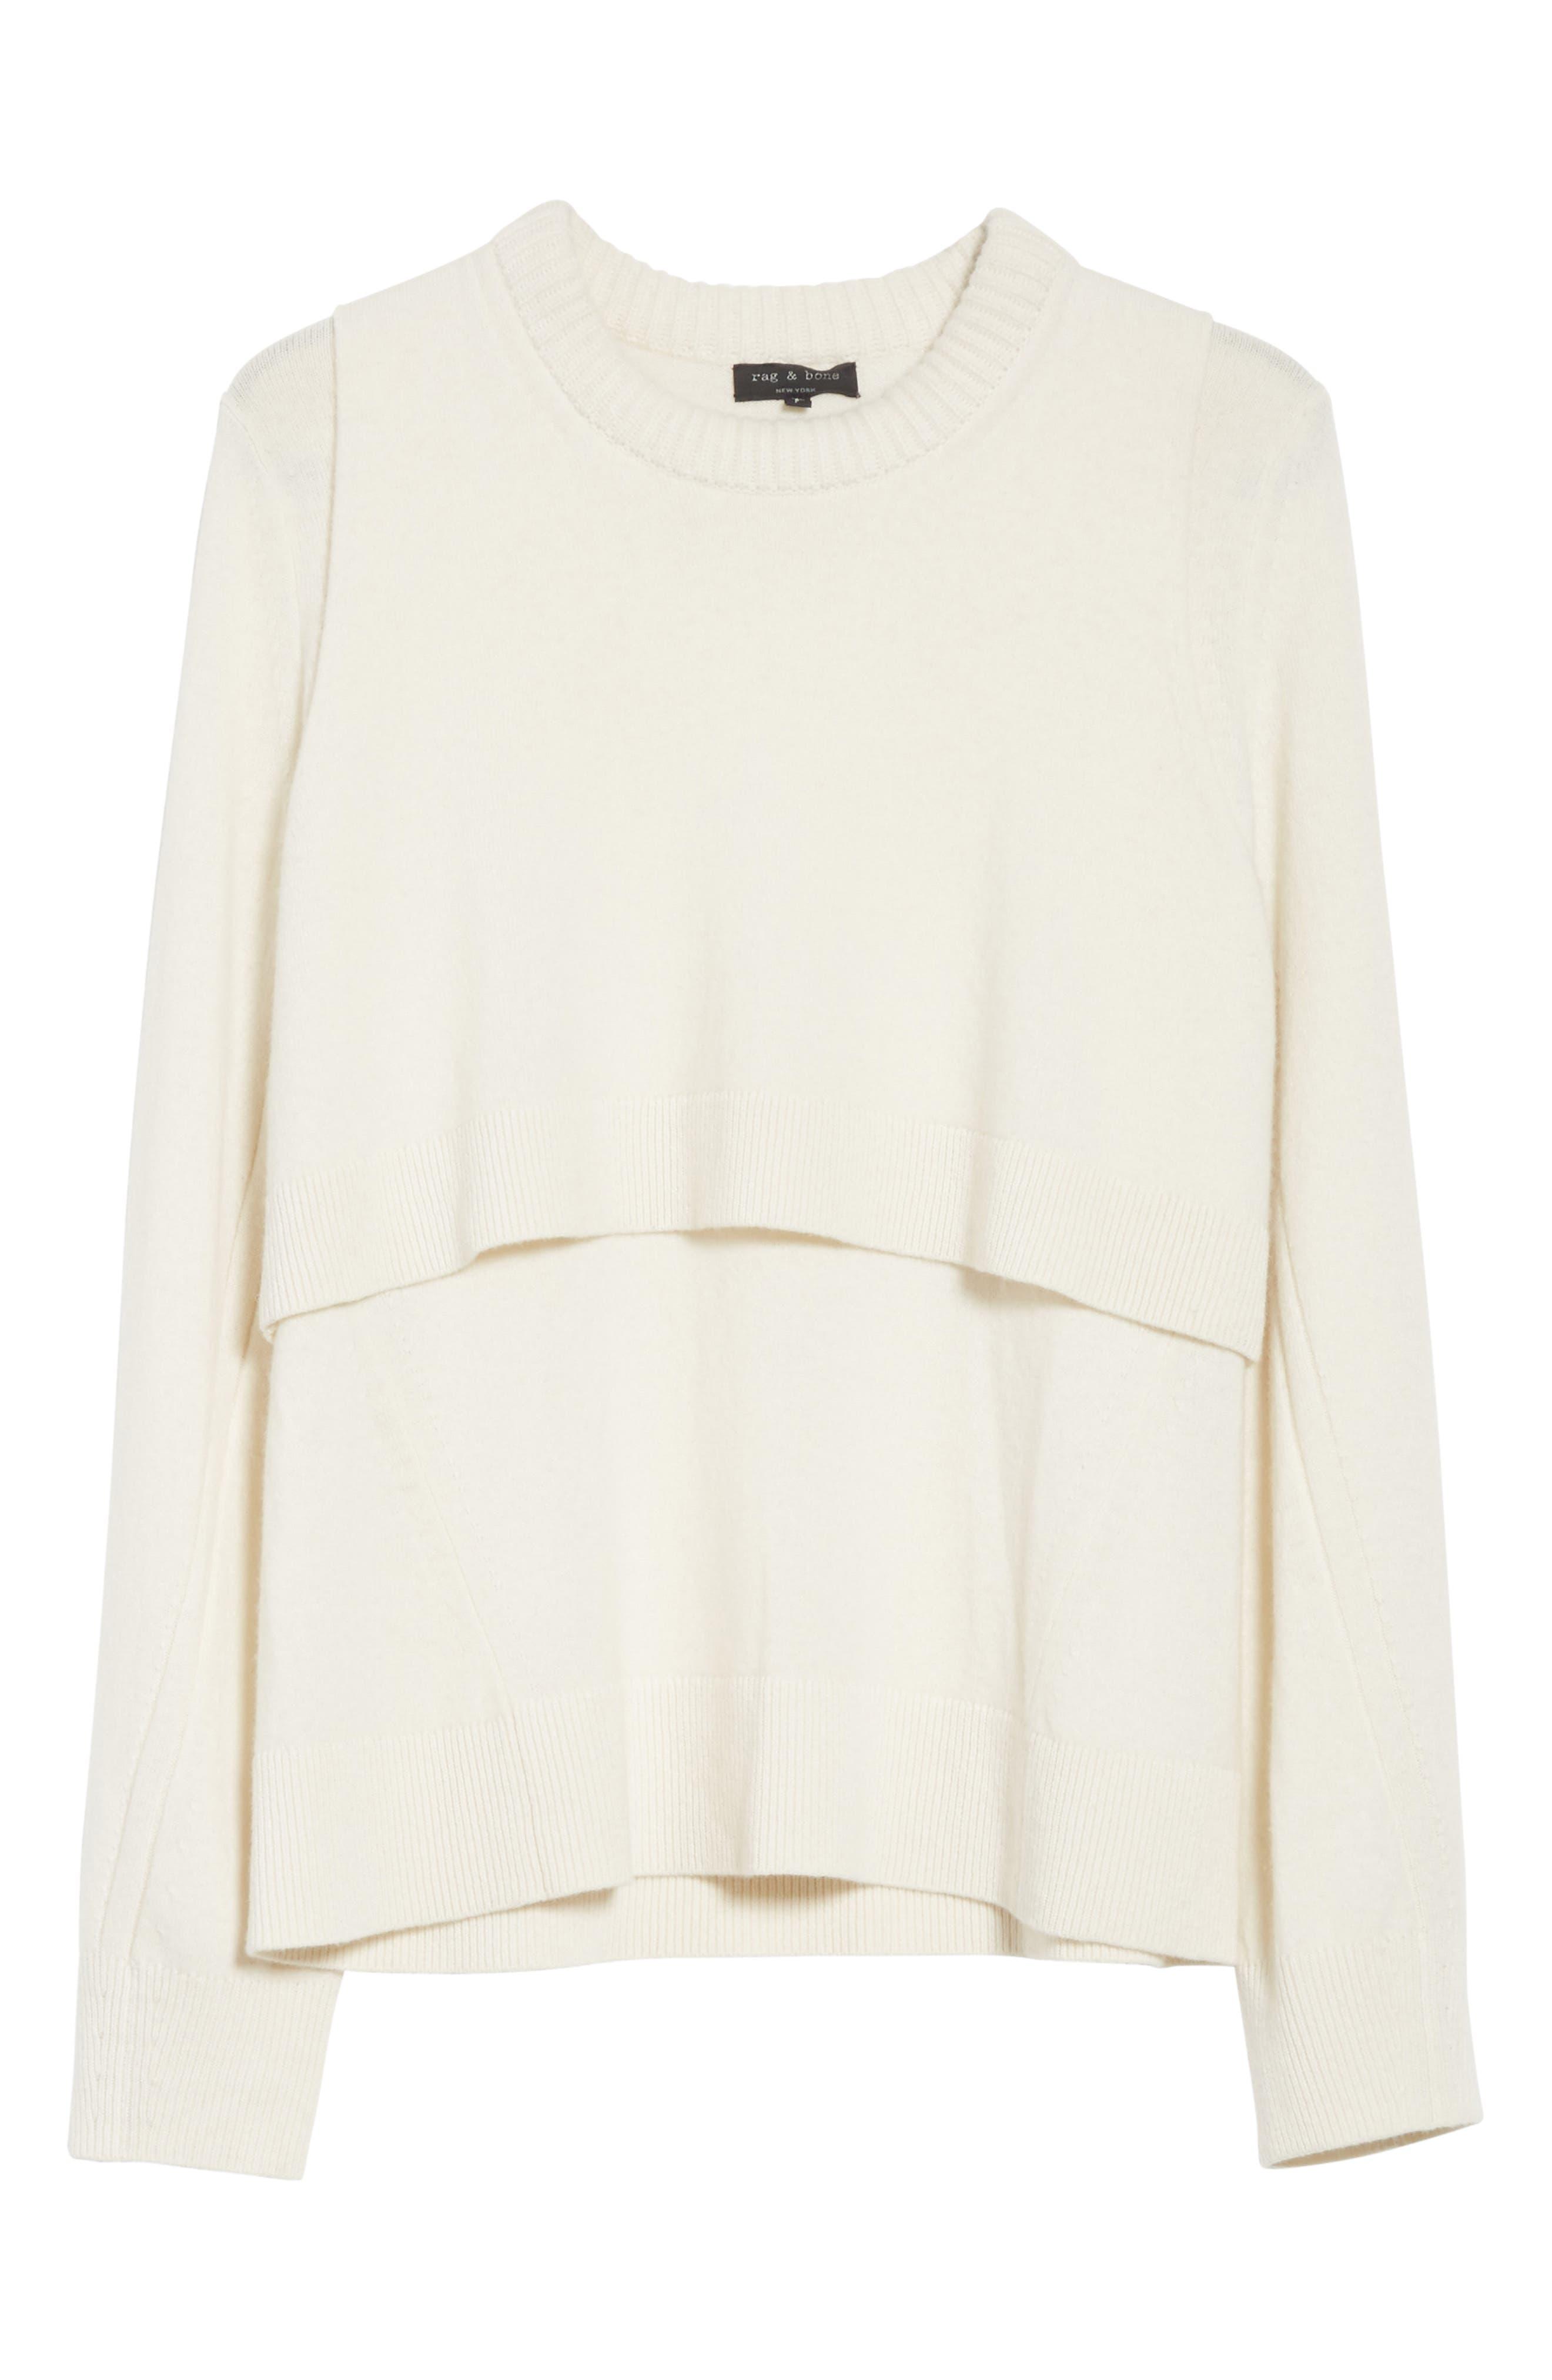 Preston Cashmere Crewneck Sweater,                             Alternate thumbnail 6, color,                             Ivory